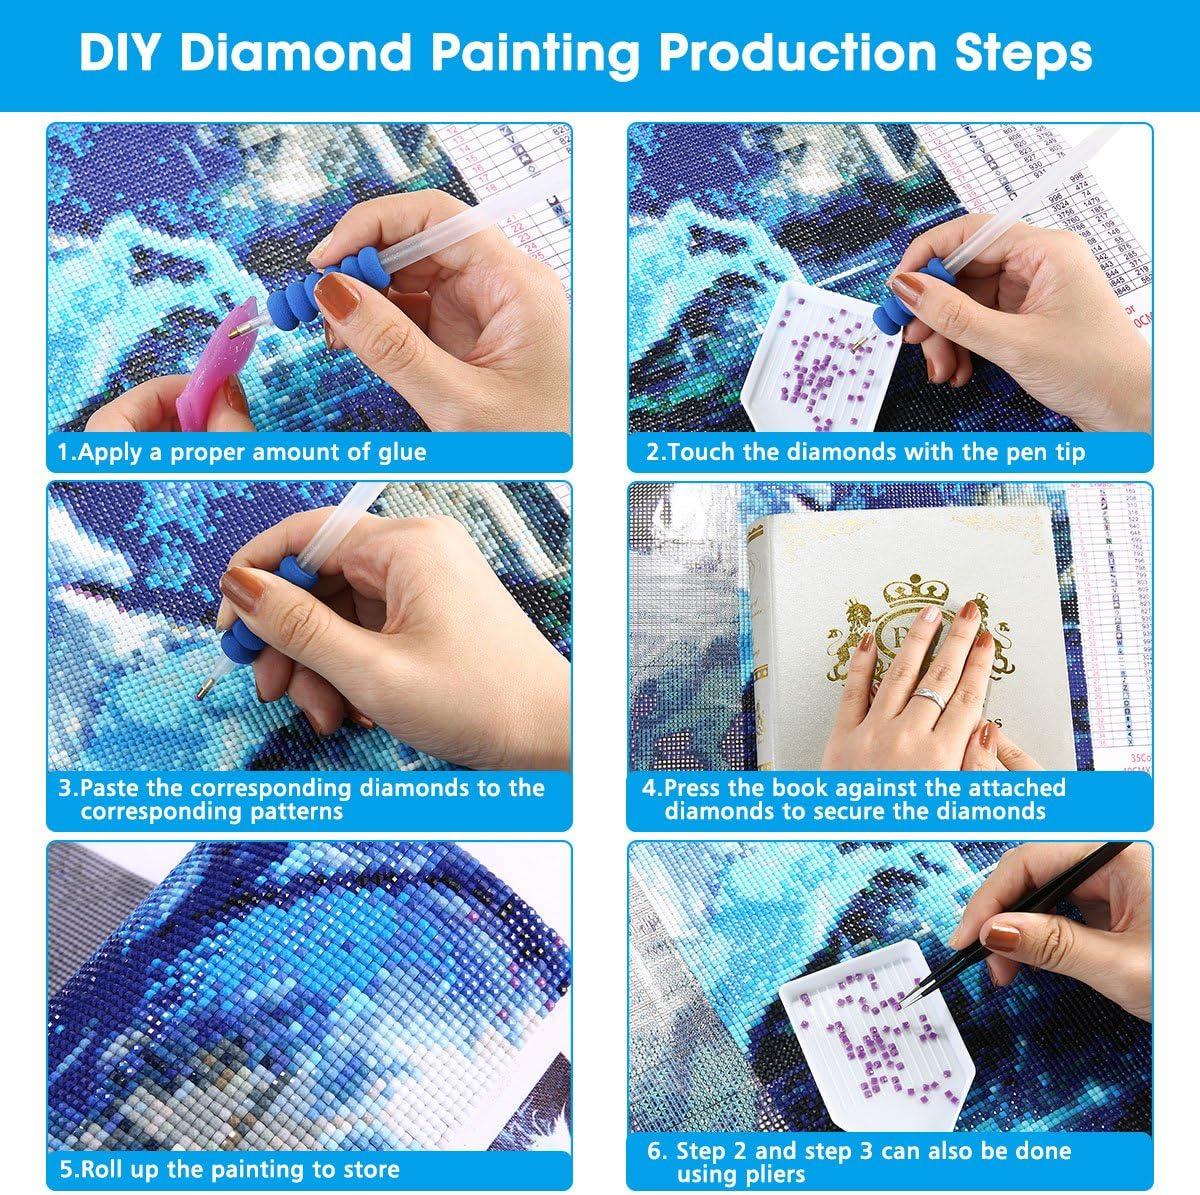 6 Pack 5D DIY Full Drill Diamond Painting Kits Diamond Painting 9.8x13.7inch JLHATLSQ Cartoon Round Crystal Rhinestone Embroidery Cross Stitch Arts Craft for Home Wall Decor Gift